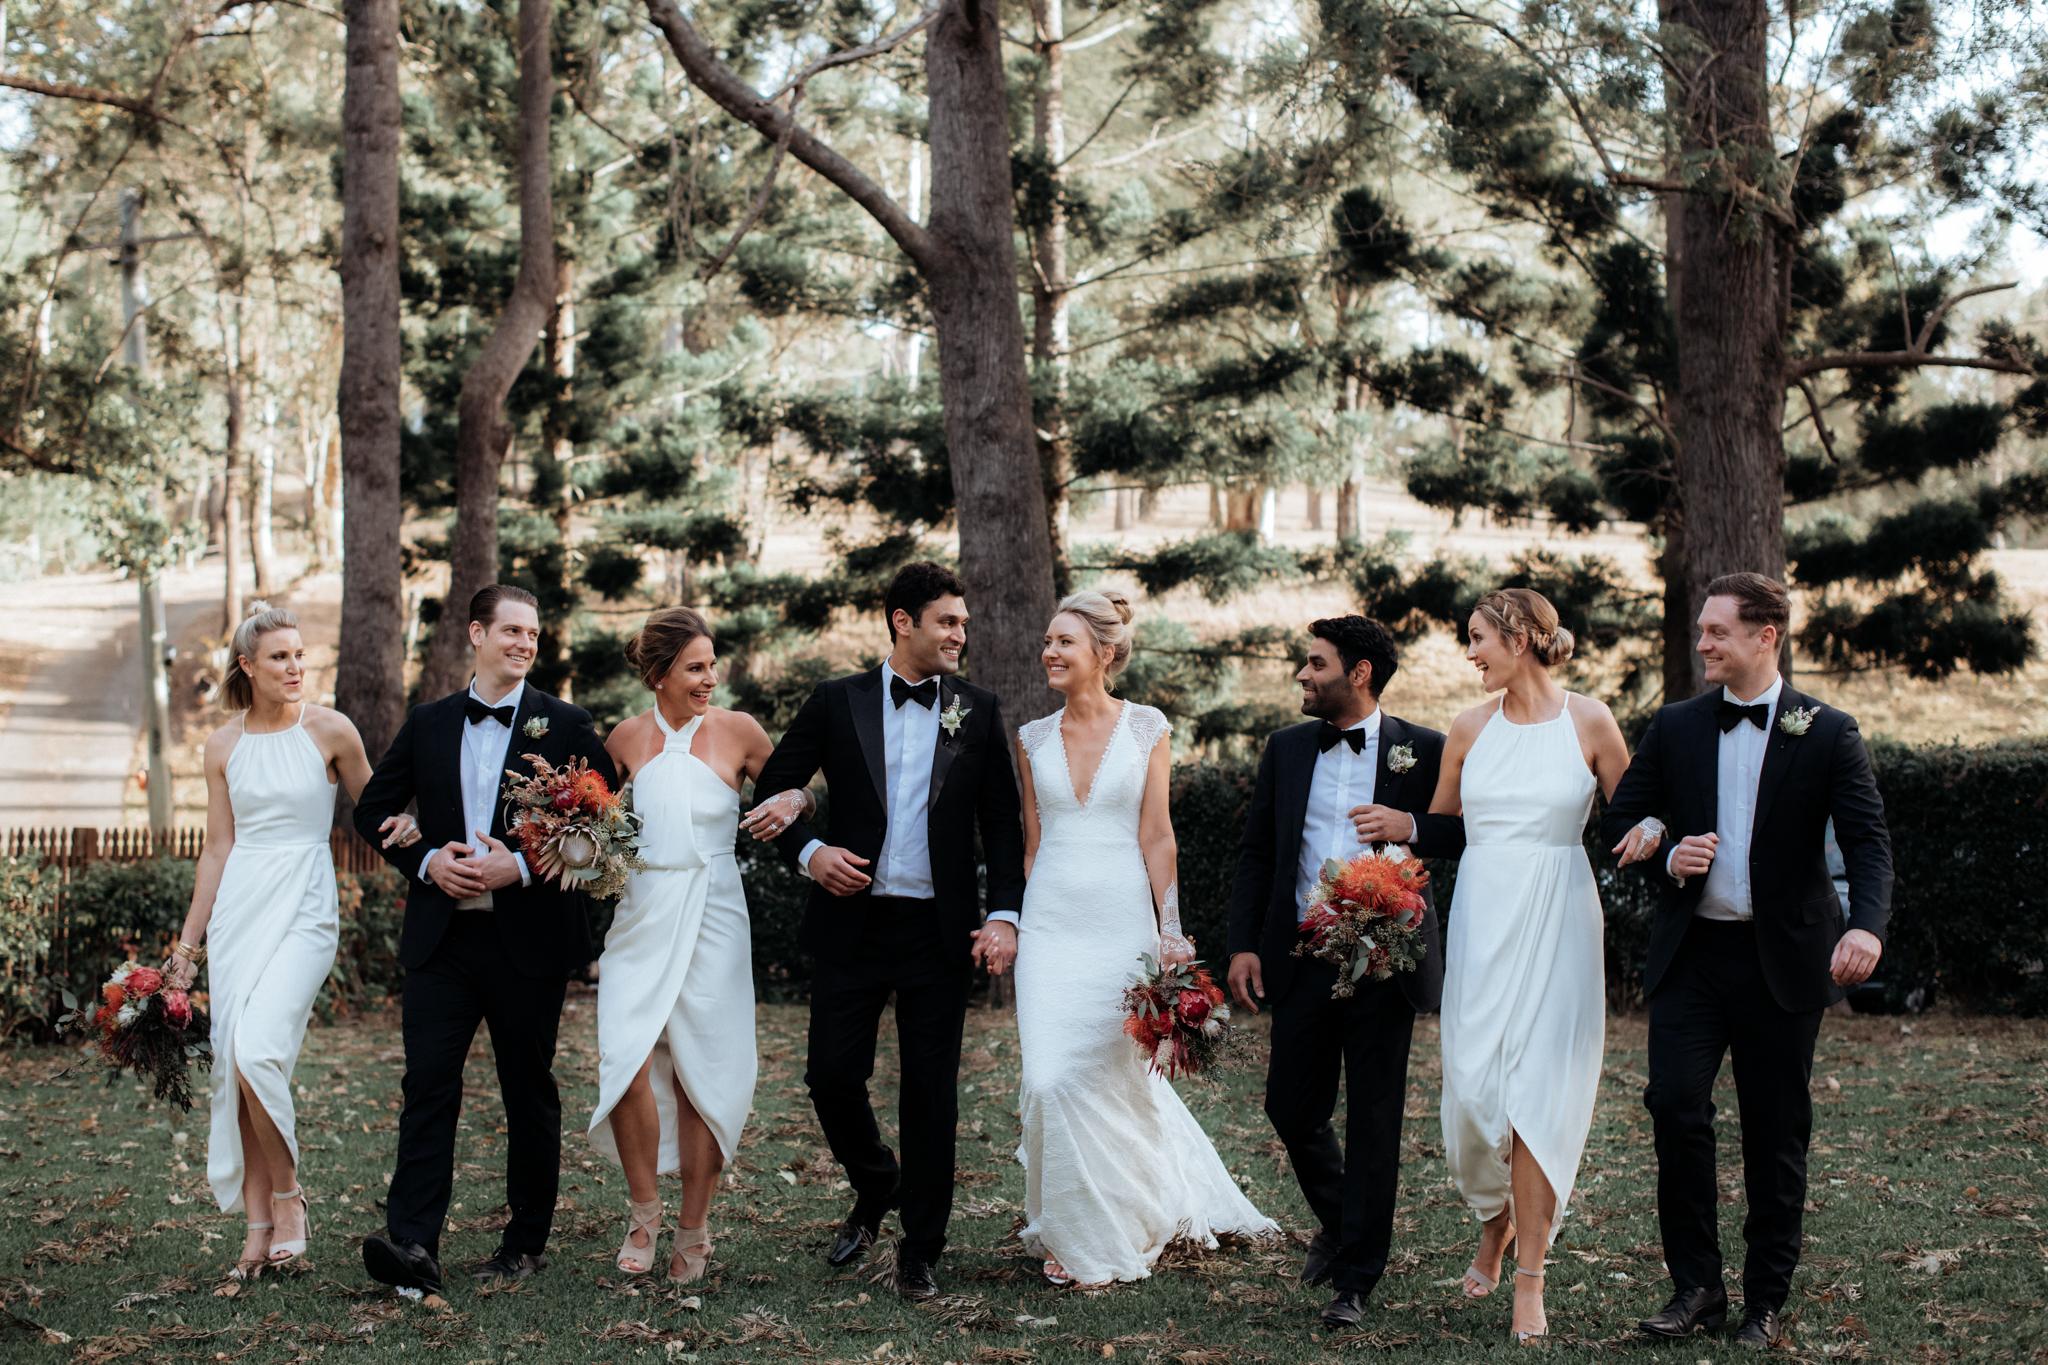 BRISBANE WEDDING PHOTOGRAPHER • BUNDALEER RAINFOREST GARDENS WEDDING • ONE DAY BRIDAL WEDDING GOWN • ROXY HOTTEN CELEBRANT • LOVELENSCAPES PHOTOGRAPHY • 111.jpg